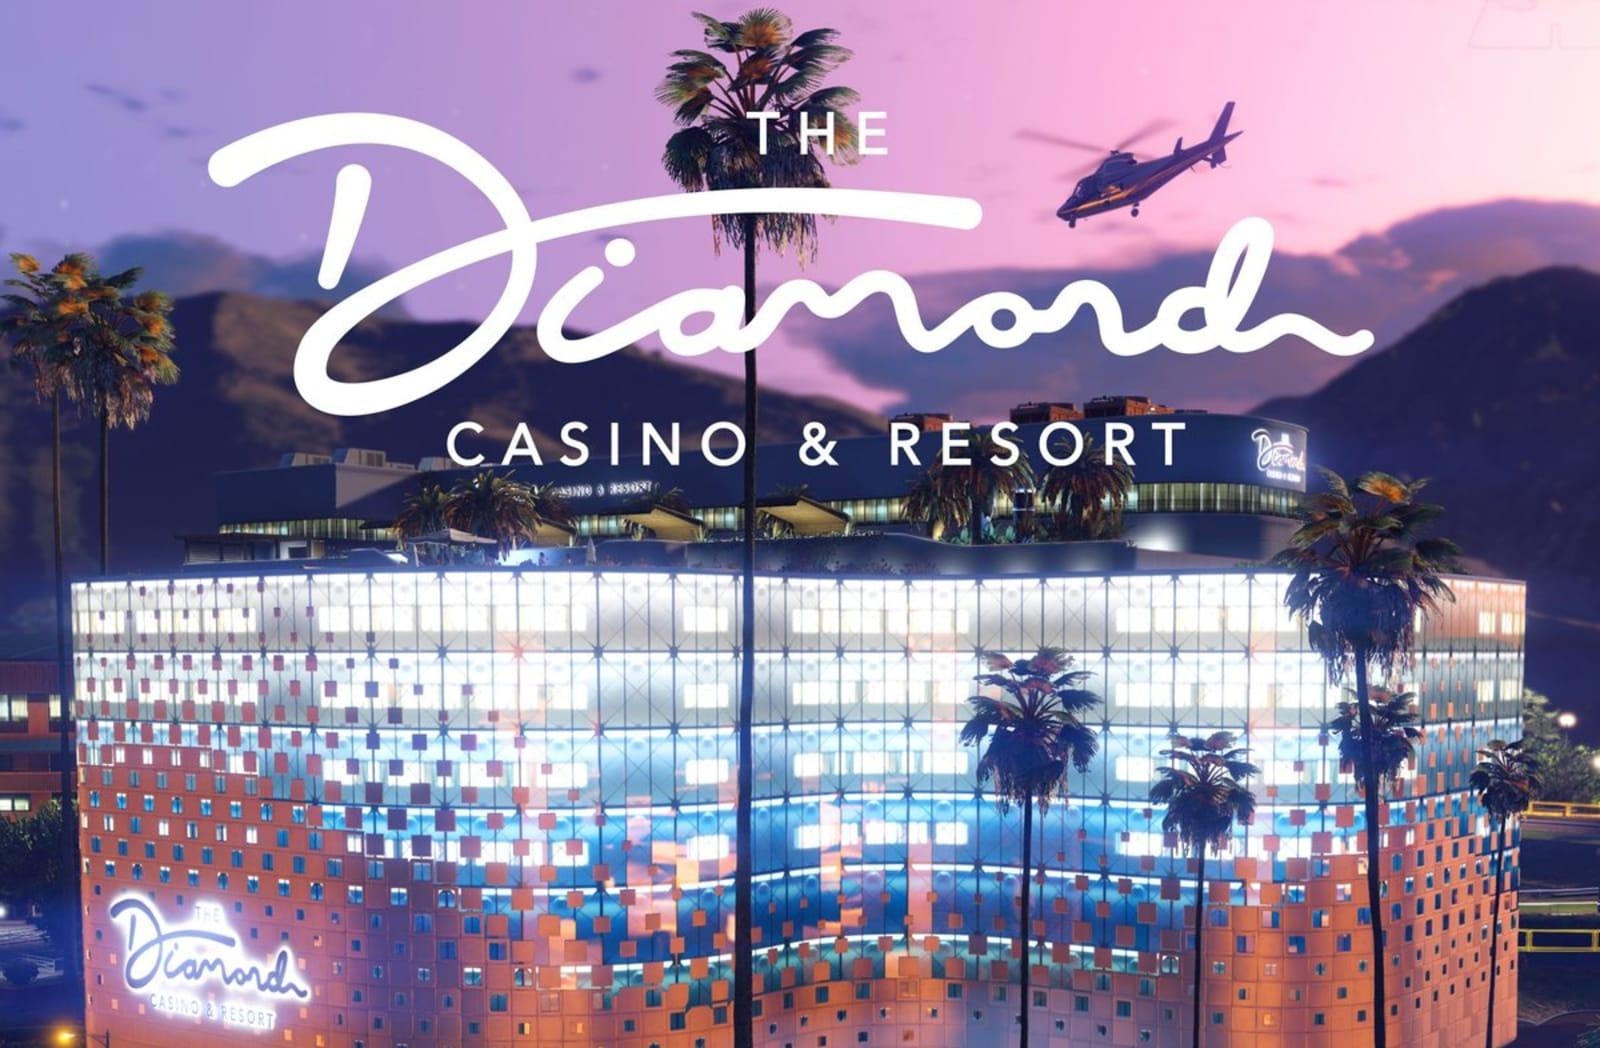 Gta Online Opens The Doors To The Diamond Casino Resort Engadget